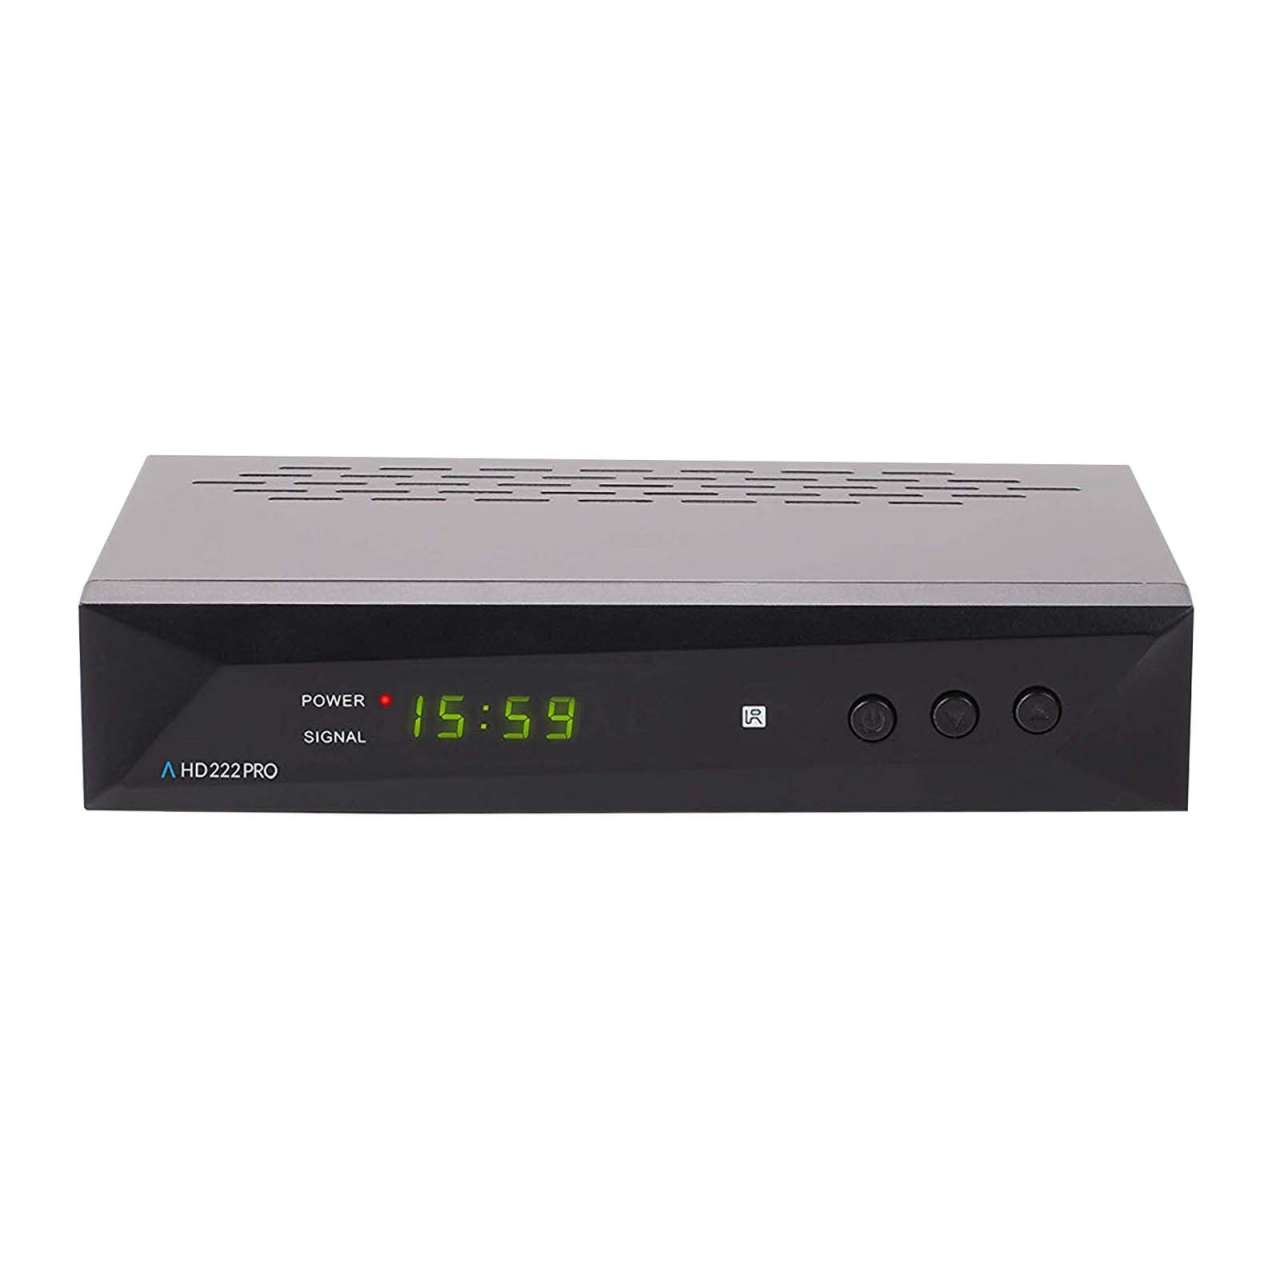 Anadol HD 222 Pro Full HD 1080p HDMI USB Scart Sat Receiver Schwarz RECANA012